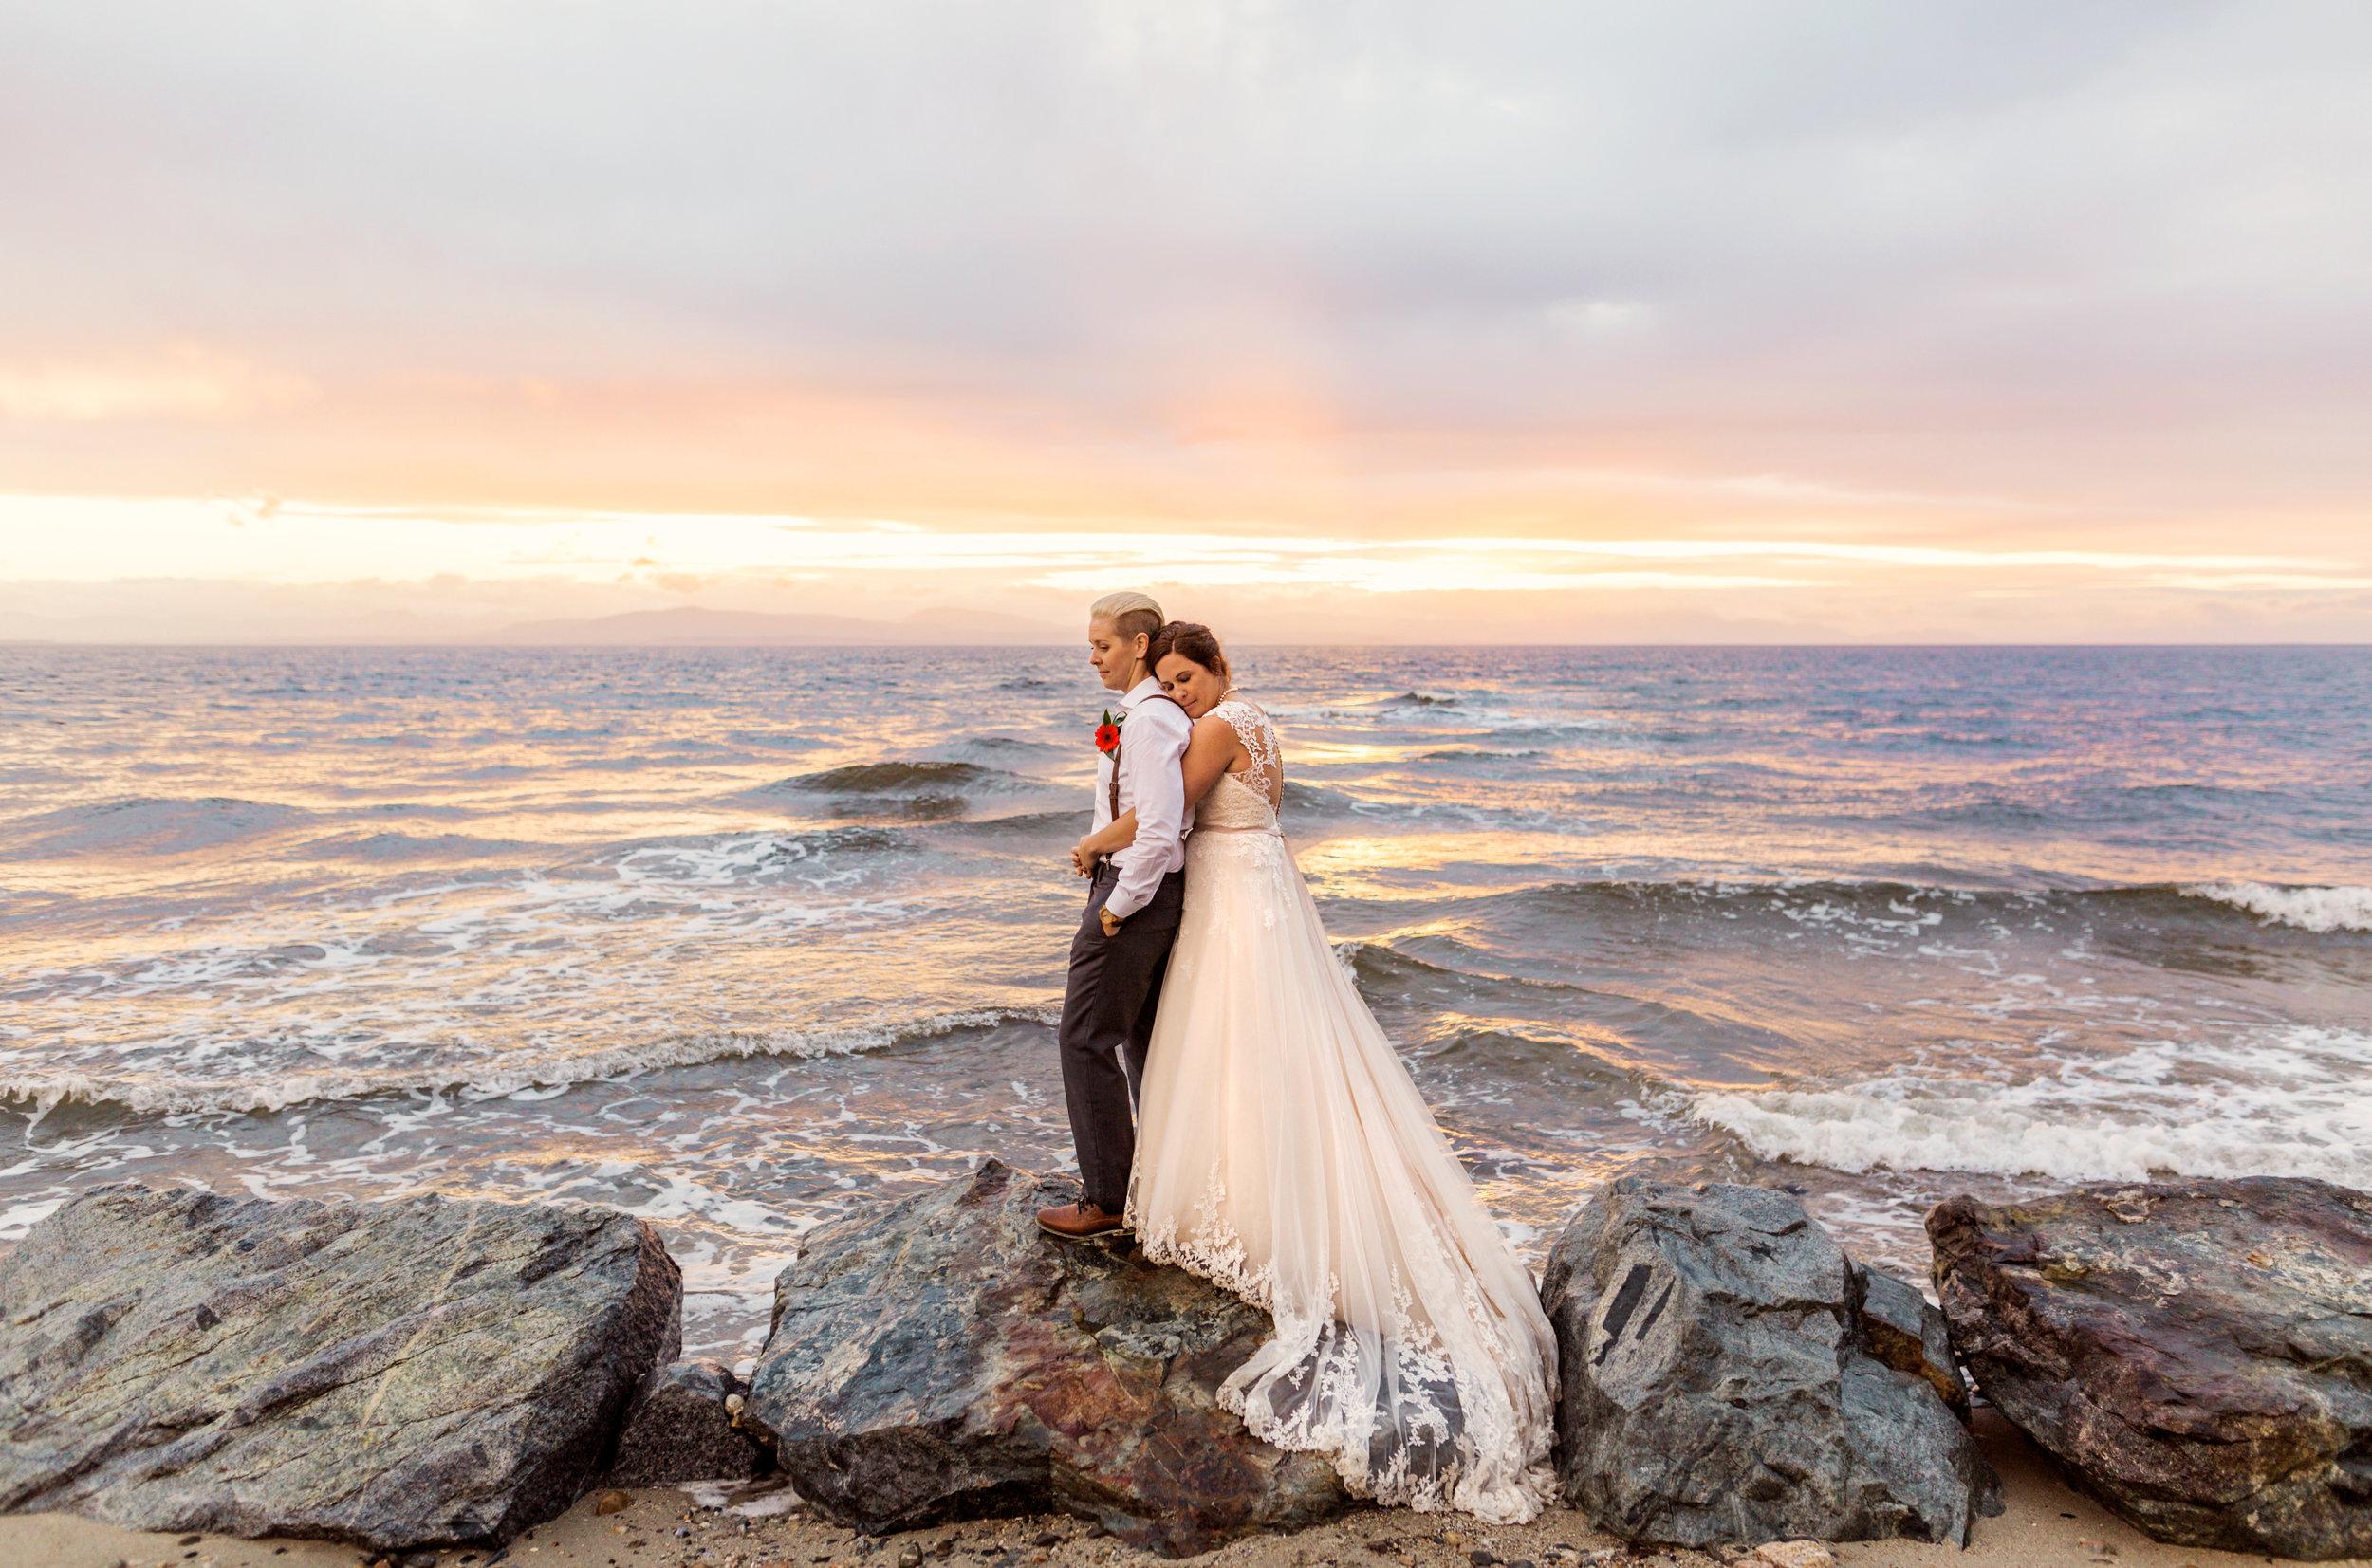 sunshine coast bc elopement, same sex wedding photographer, sunshine coast bc wedding photographer, same sex wedding